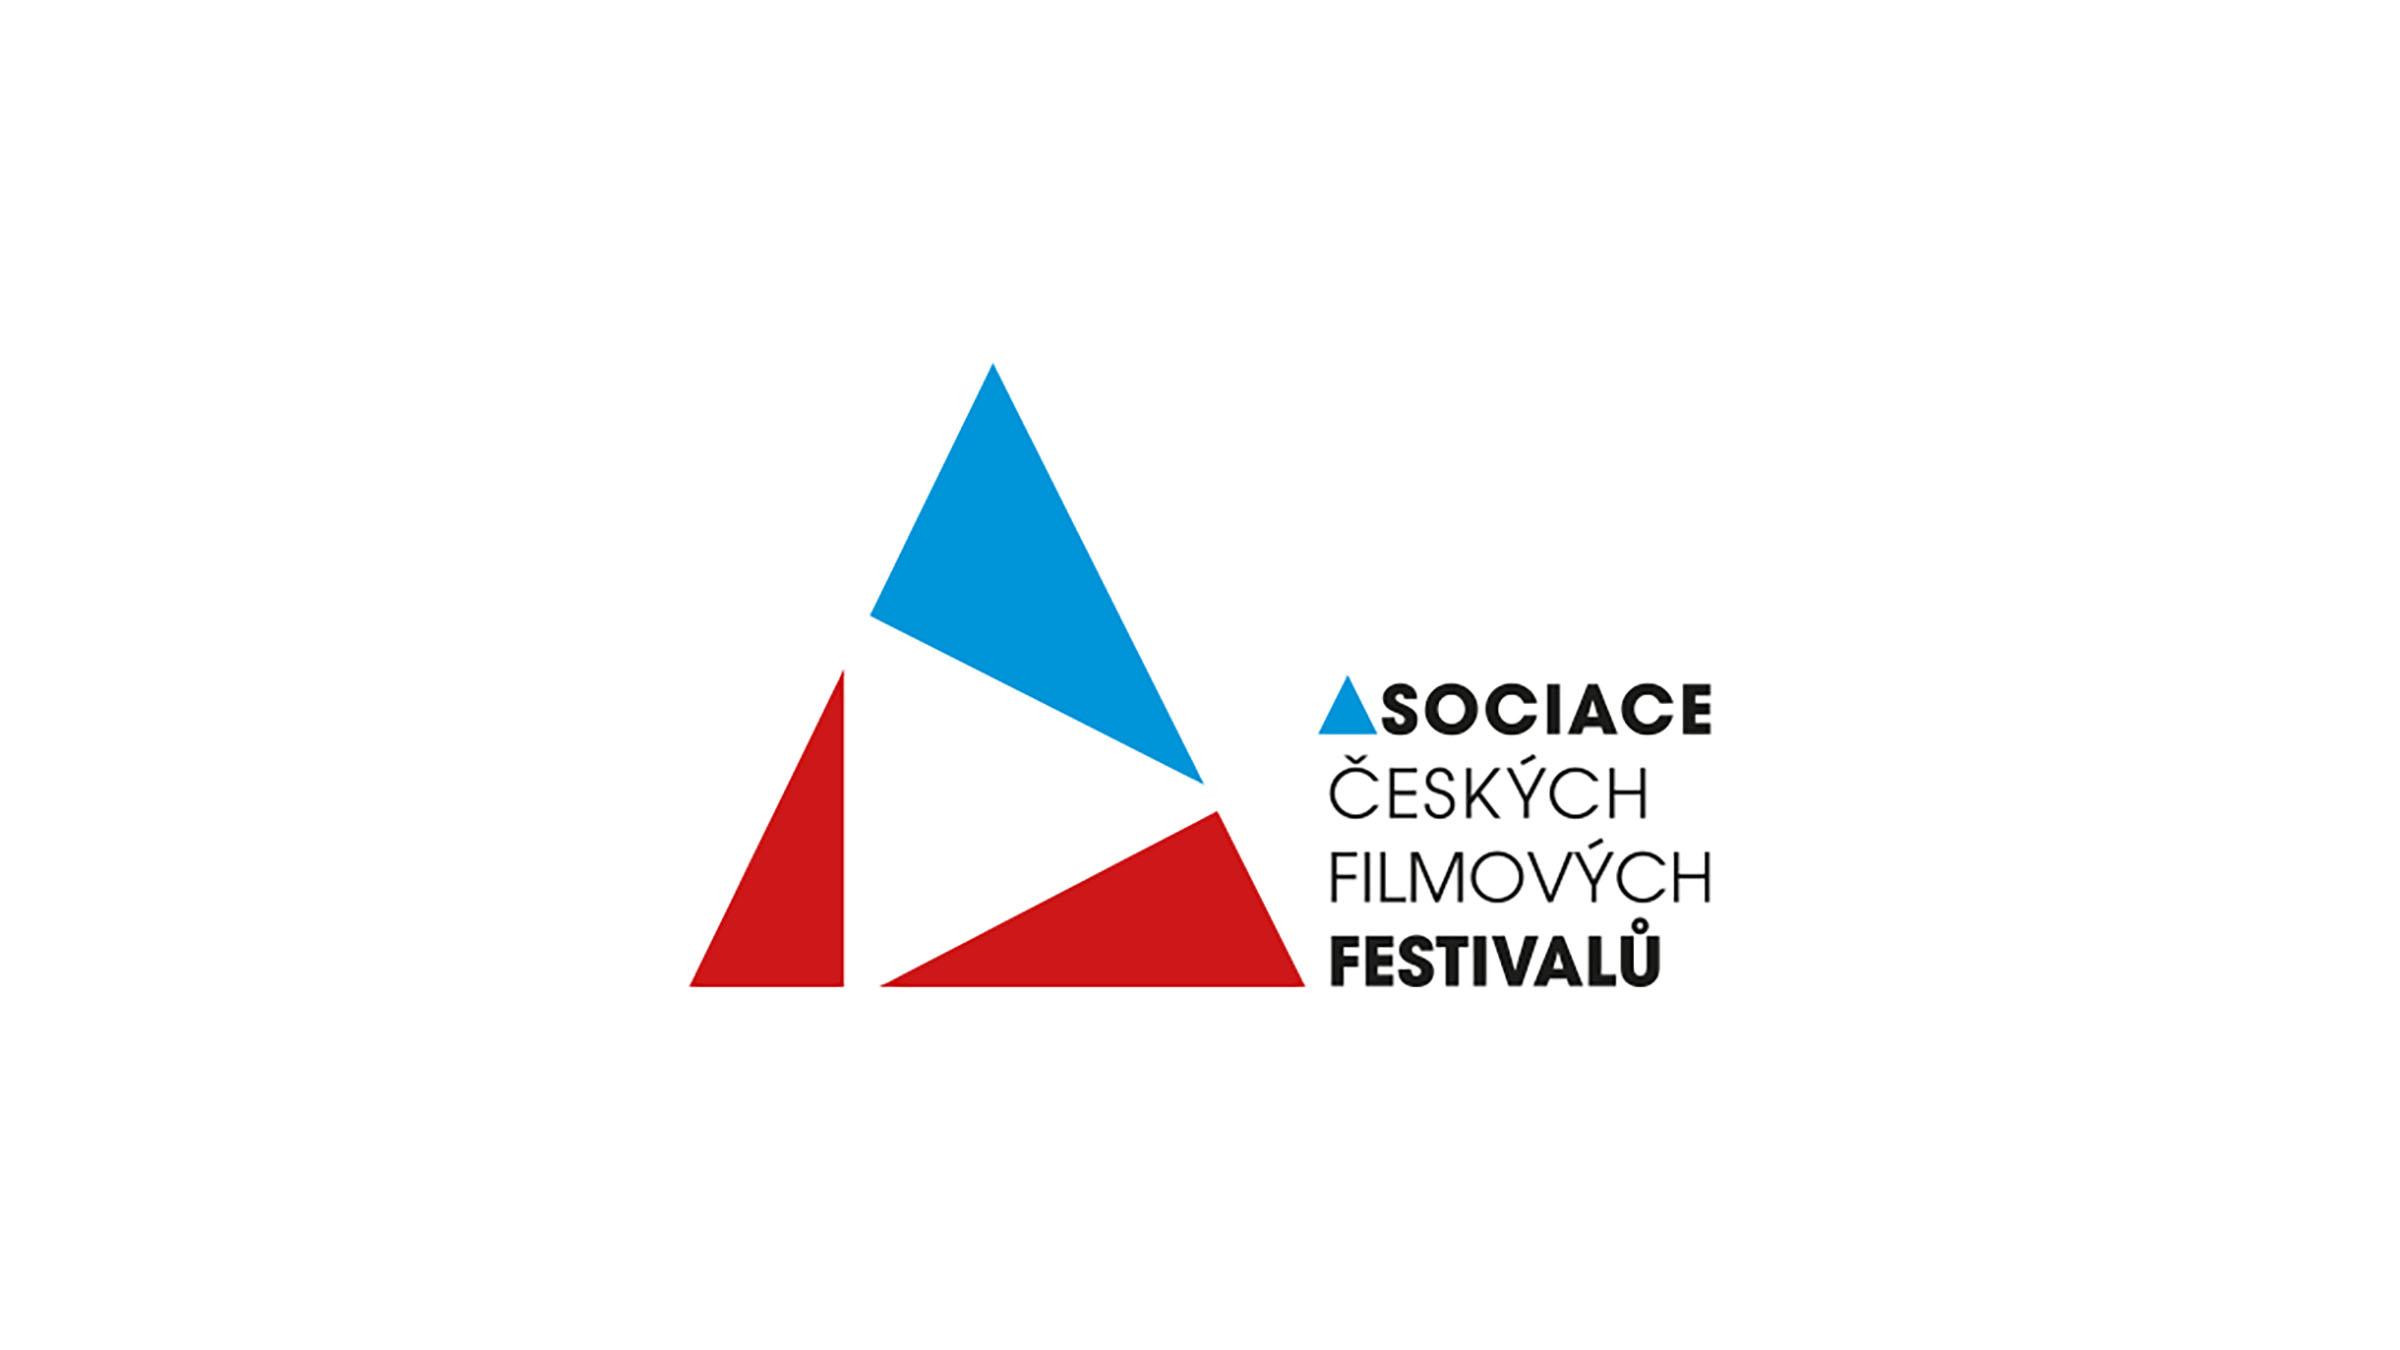 Zakládáme Asociaci českých filmových festivalů